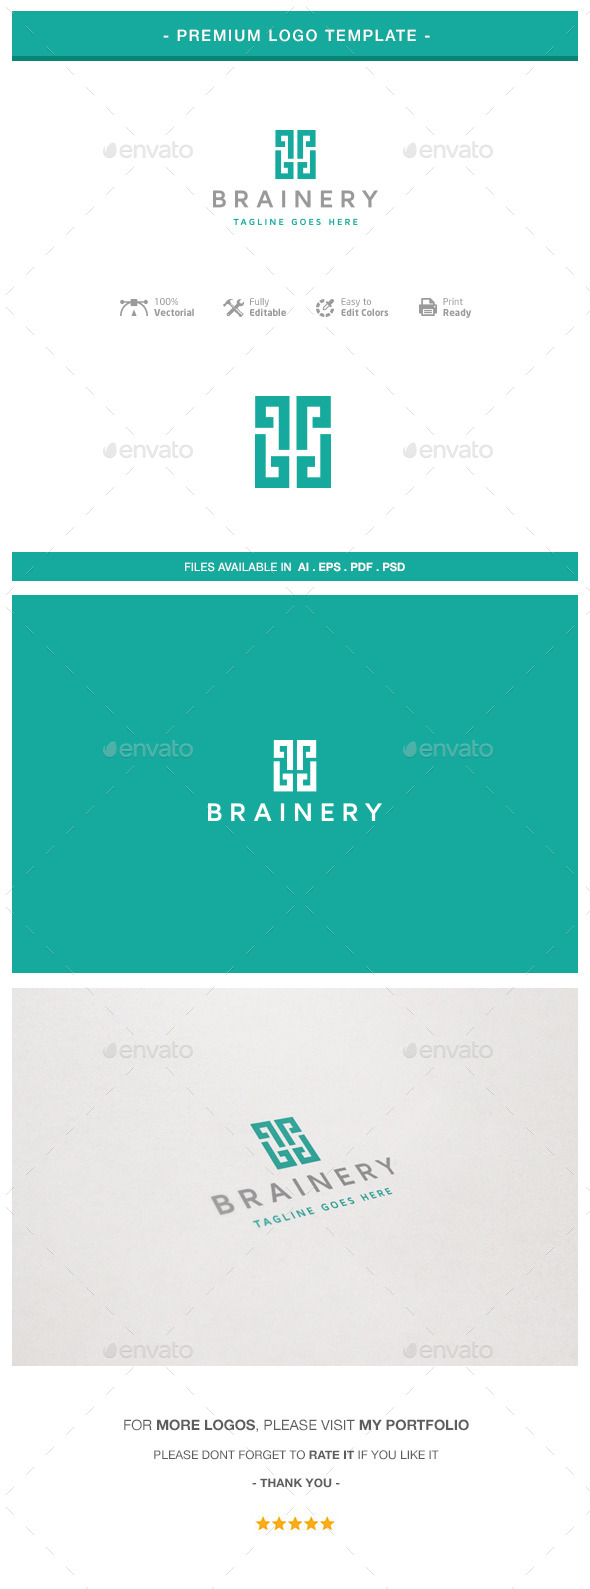 GraphicRiver Brainery Logo 10760761